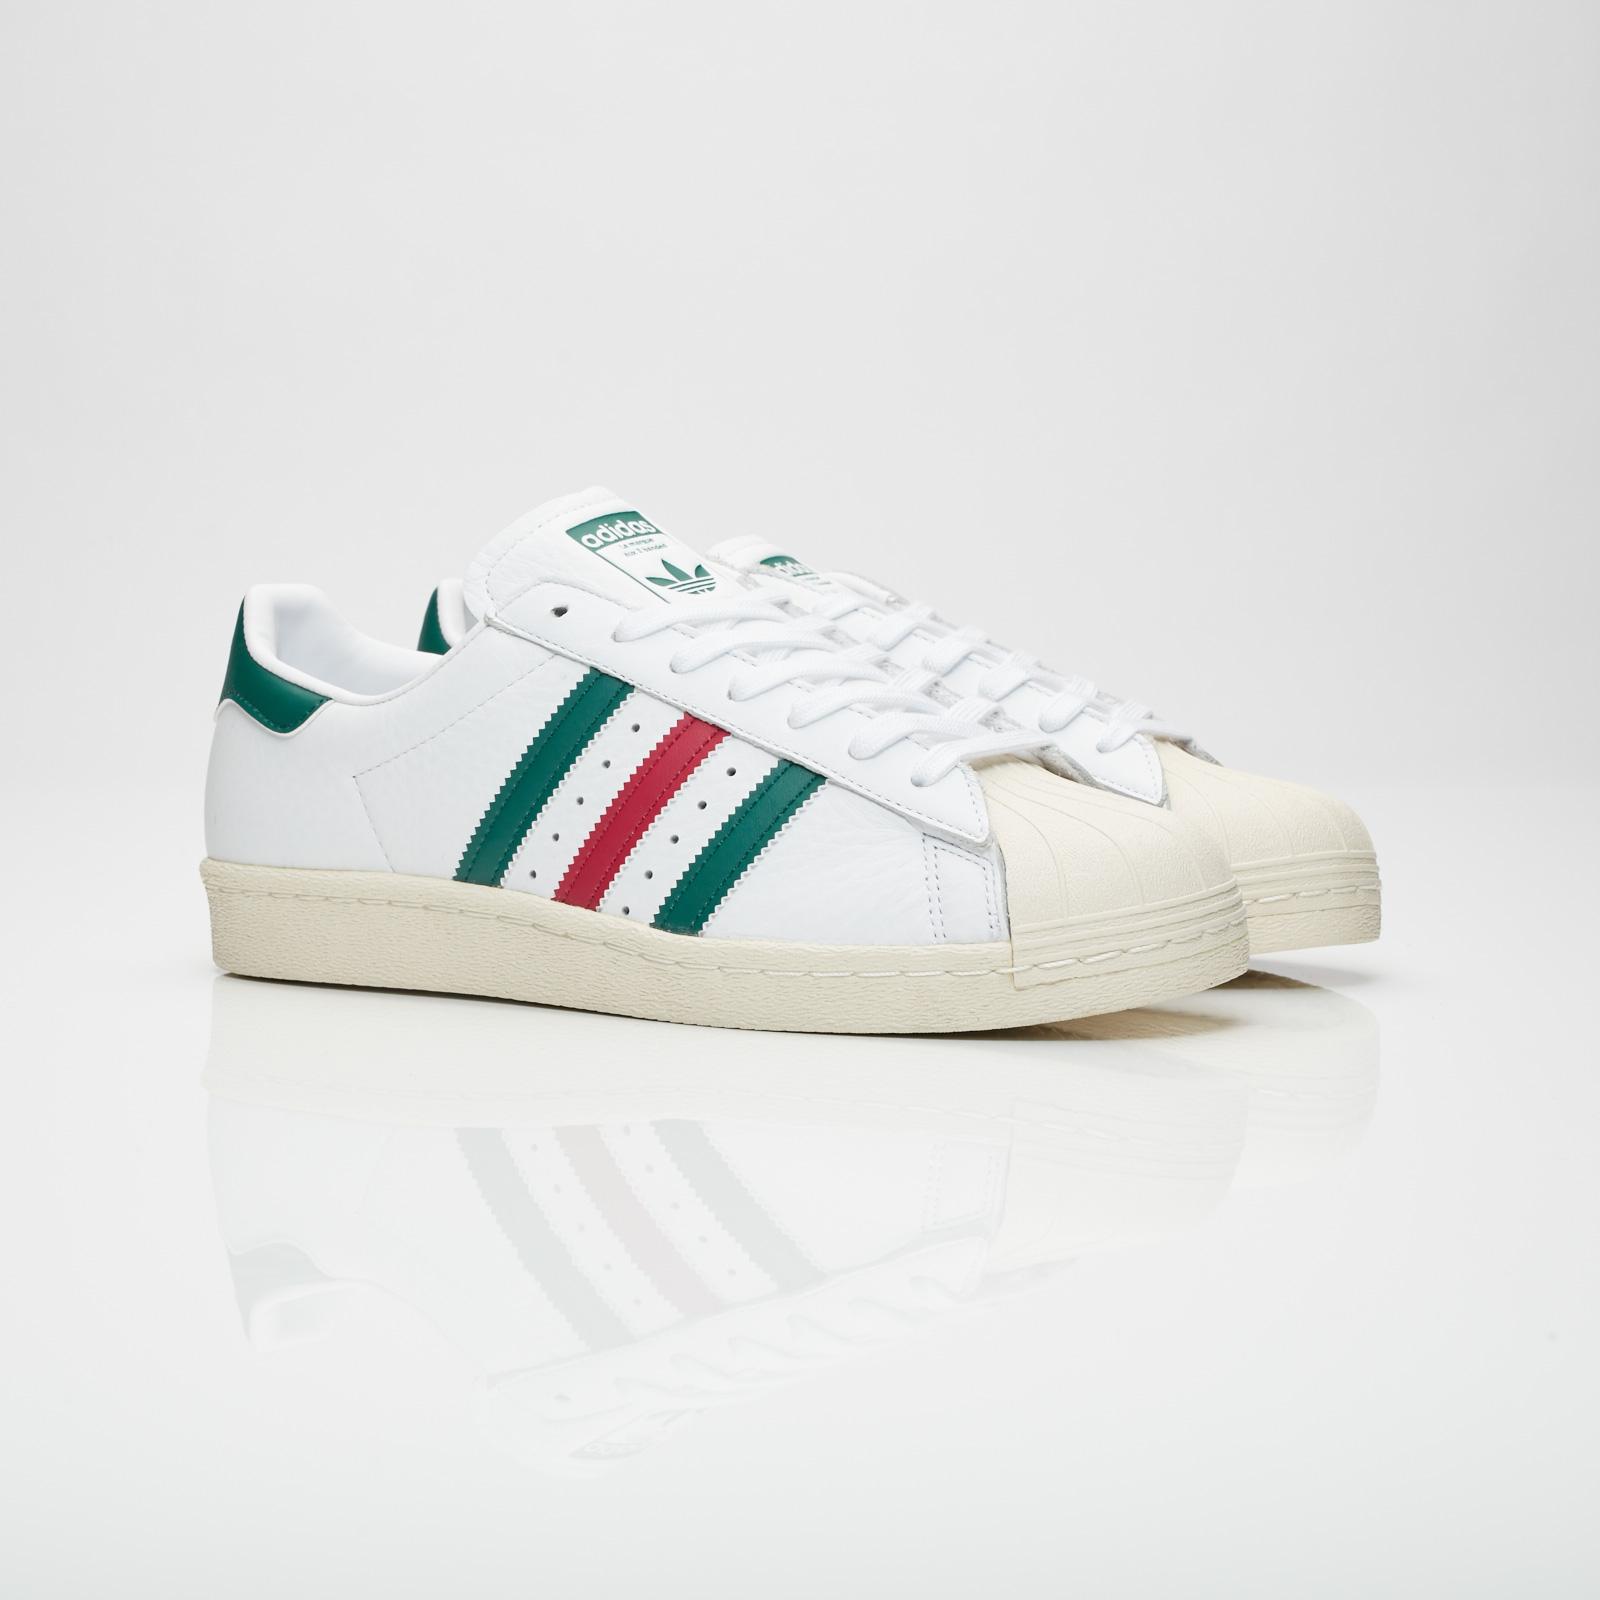 adidas superstar green back